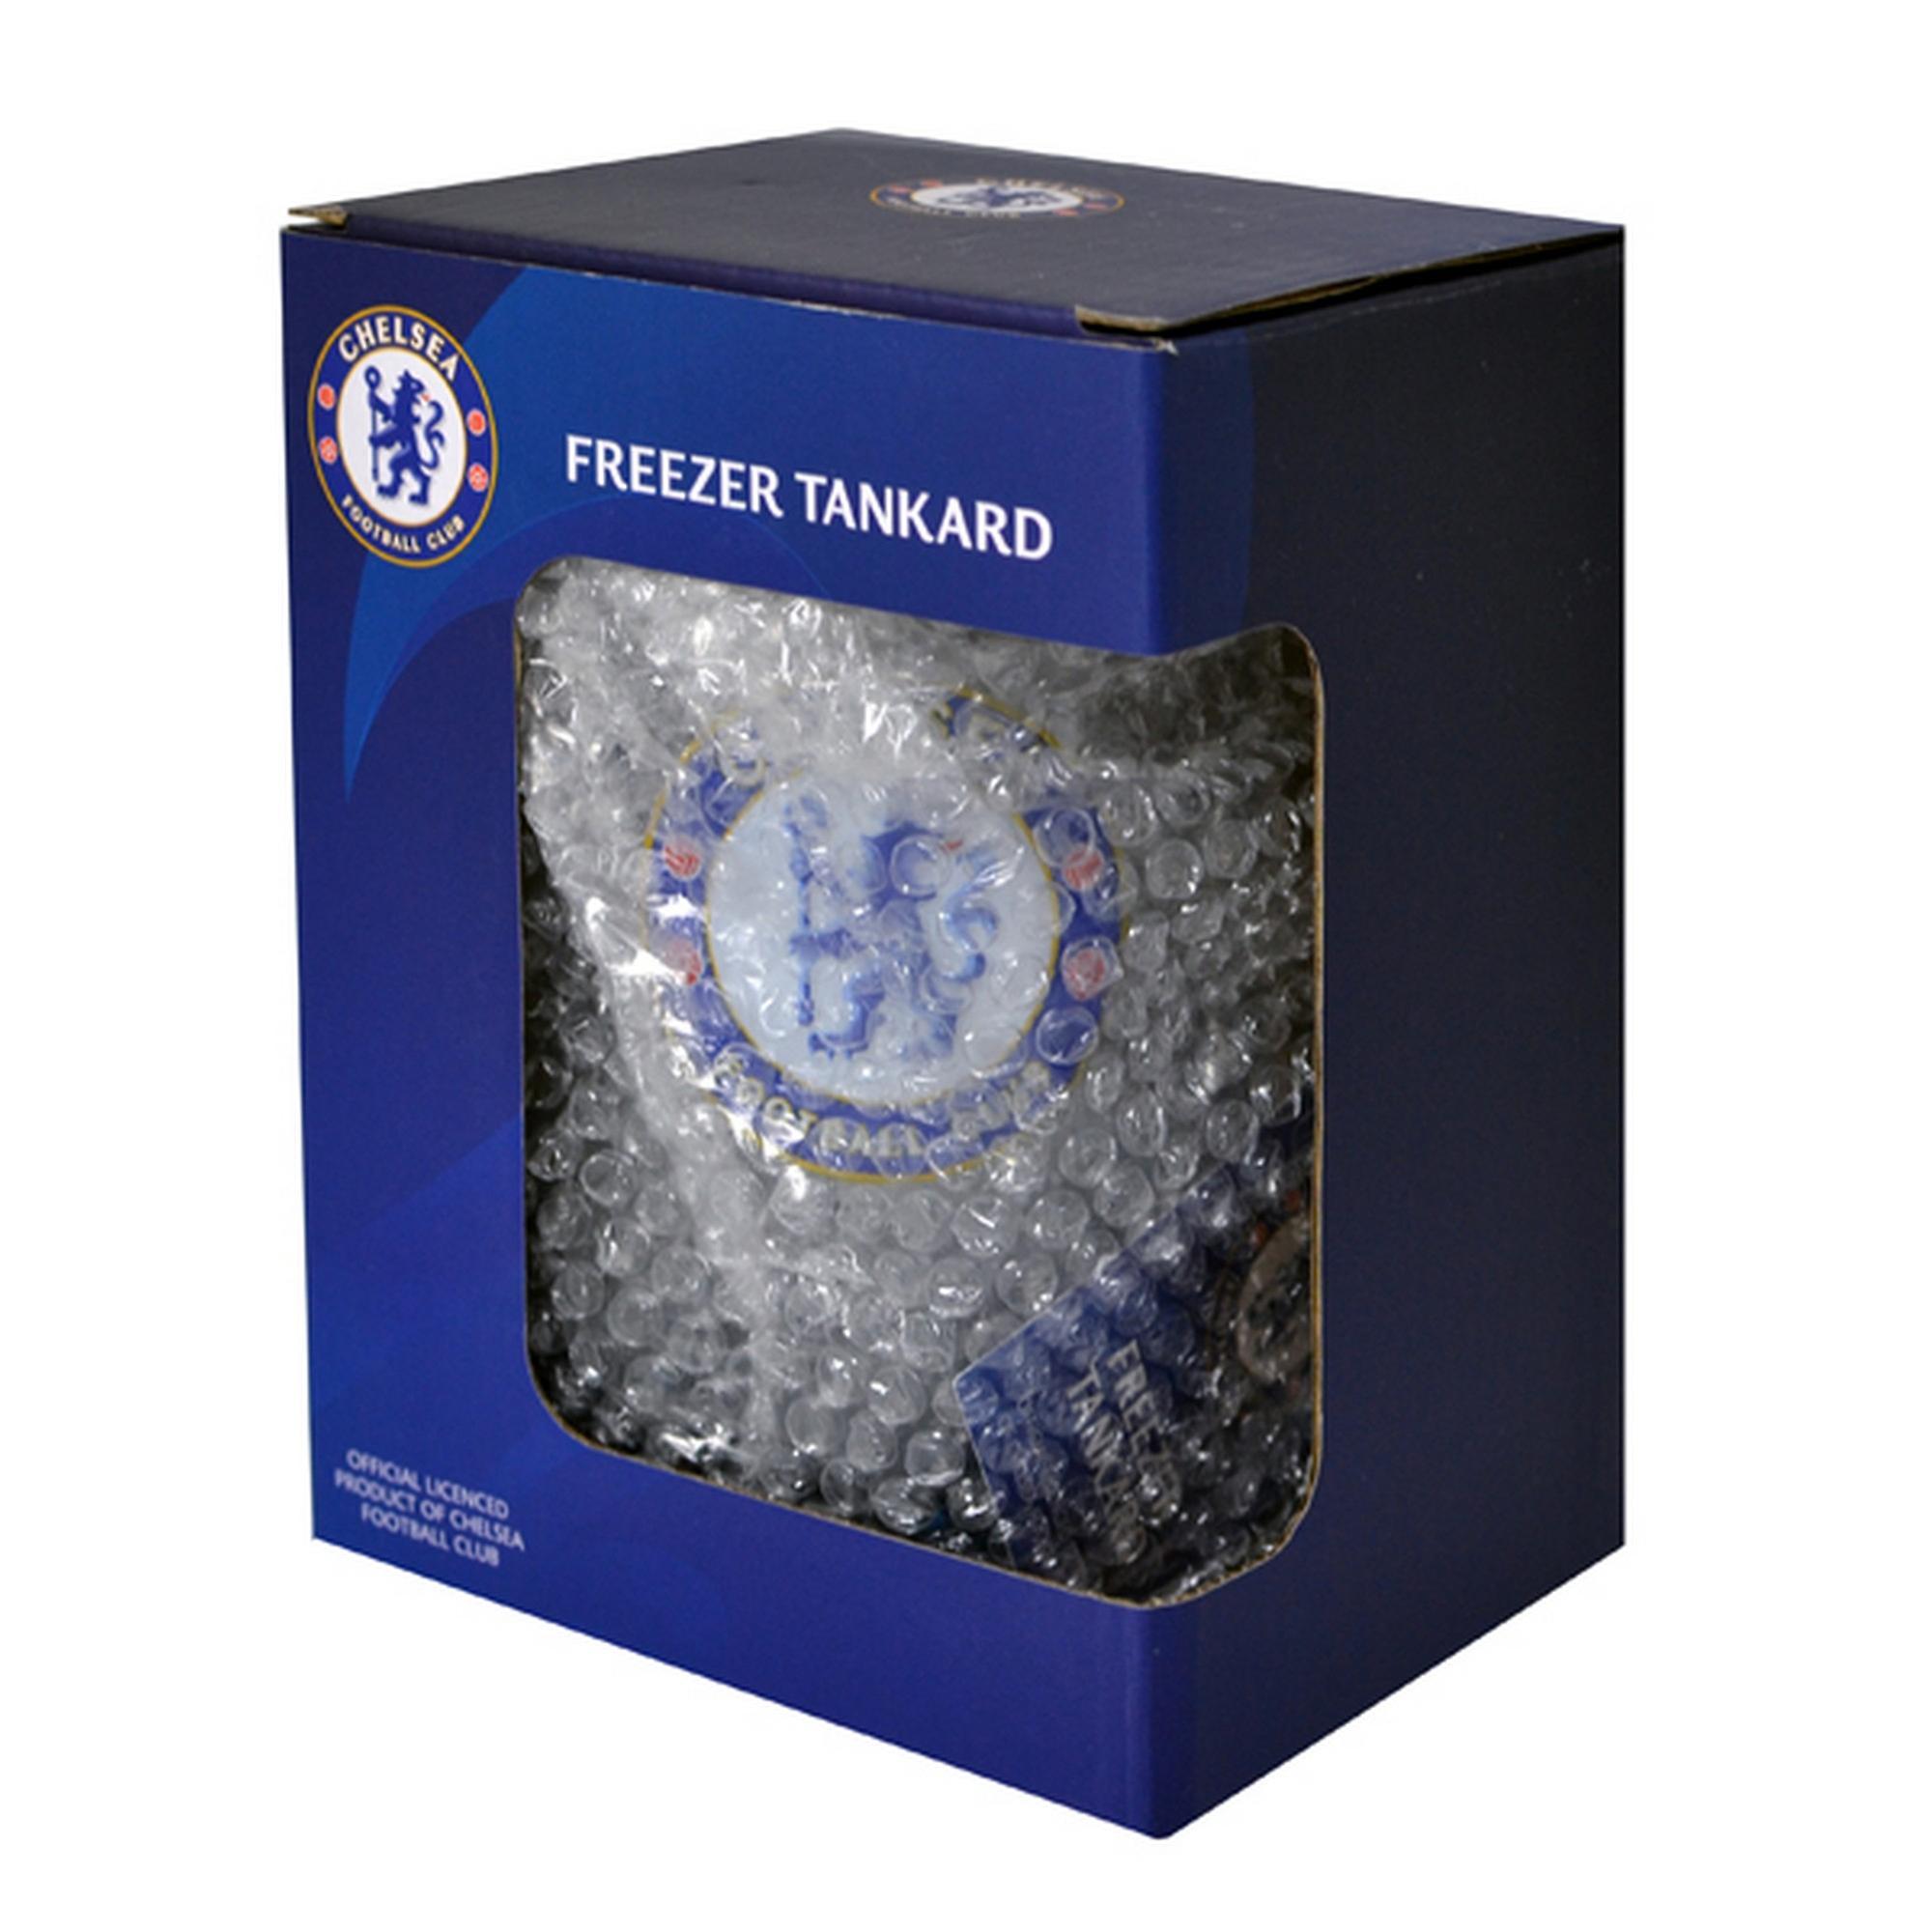 Chelsea Boxed Freezer Tankard